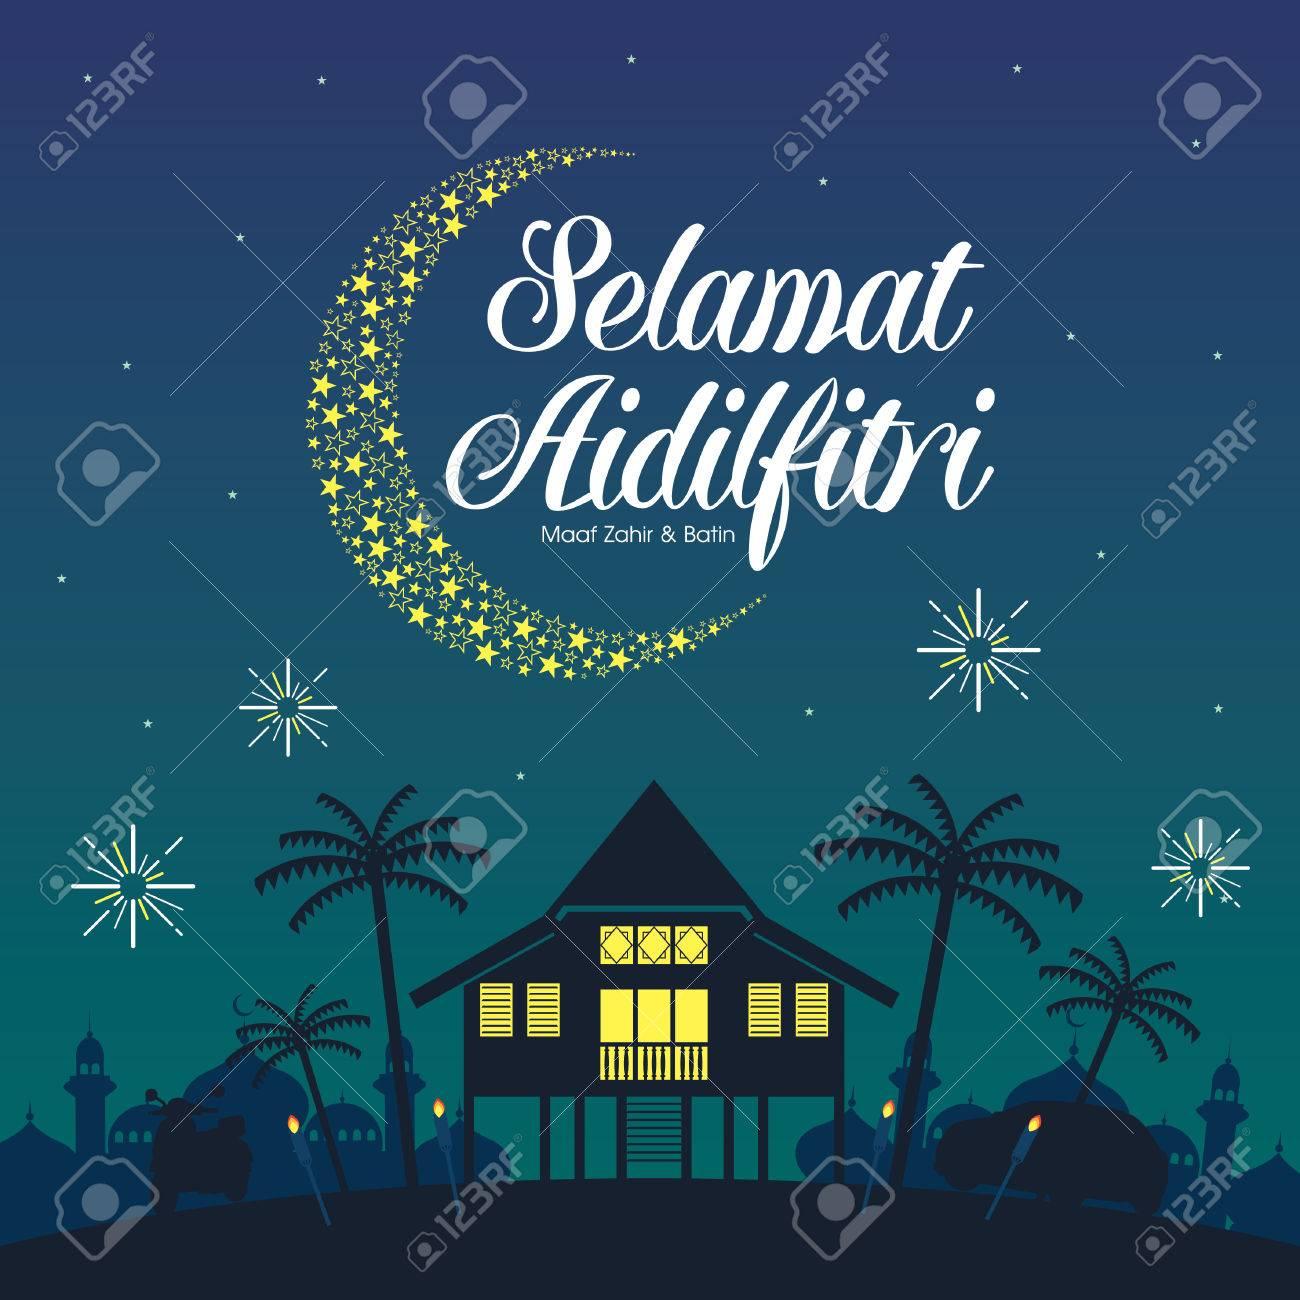 Selamat Hari Raya Aidilfitri vector illustration with traditional malay village house / Kampung. Caption: Fasting Day of Celebration - 79013944